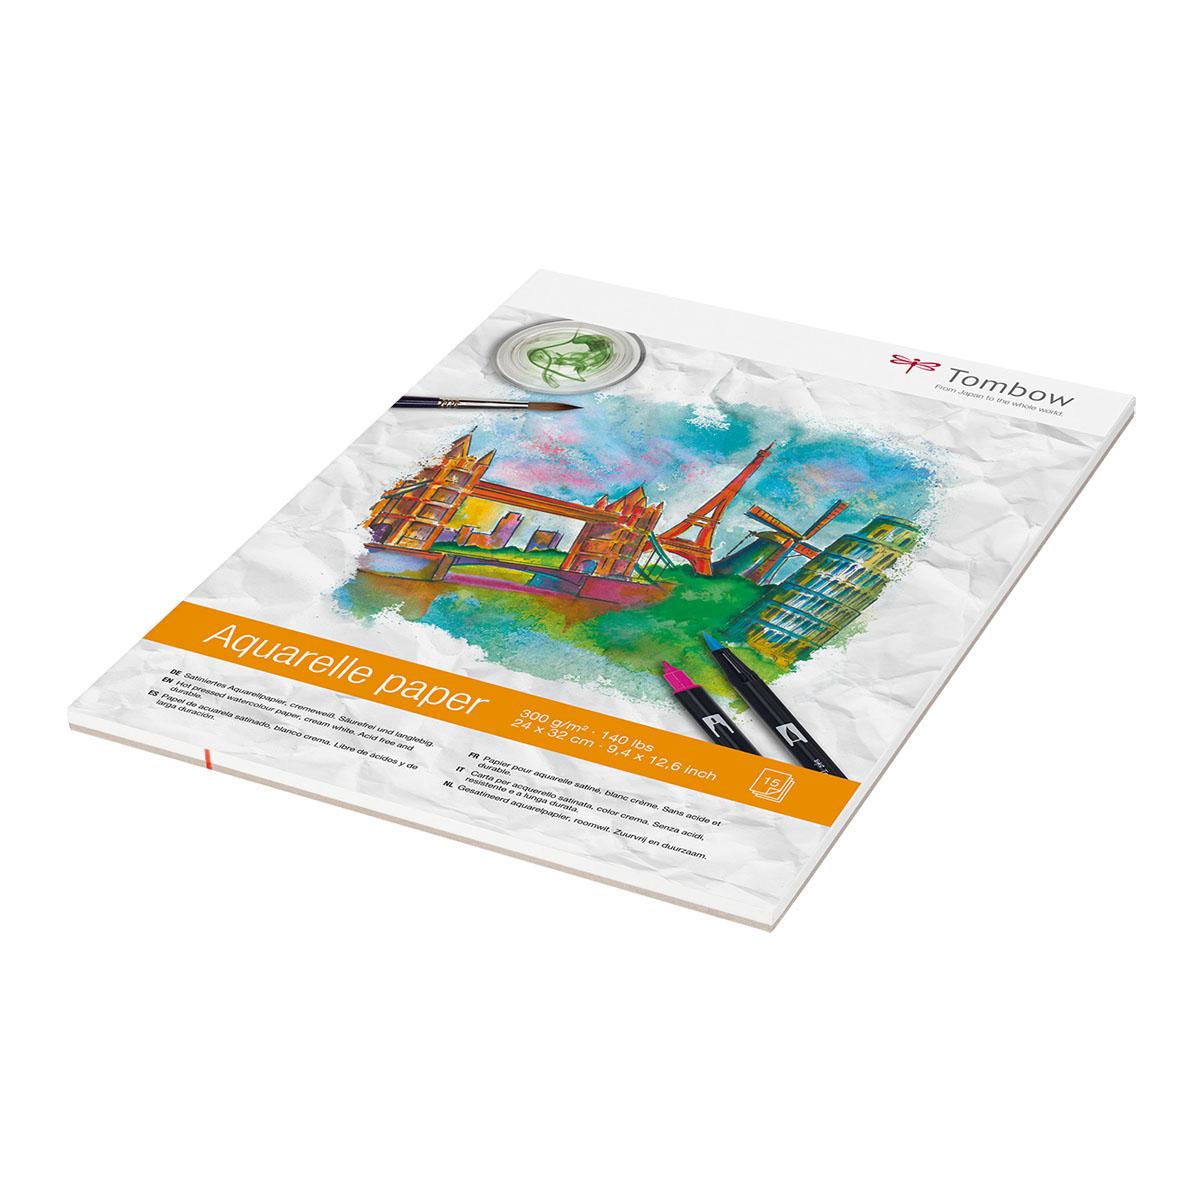 Tombow Aquarelle Paper 2432 Cm 300g